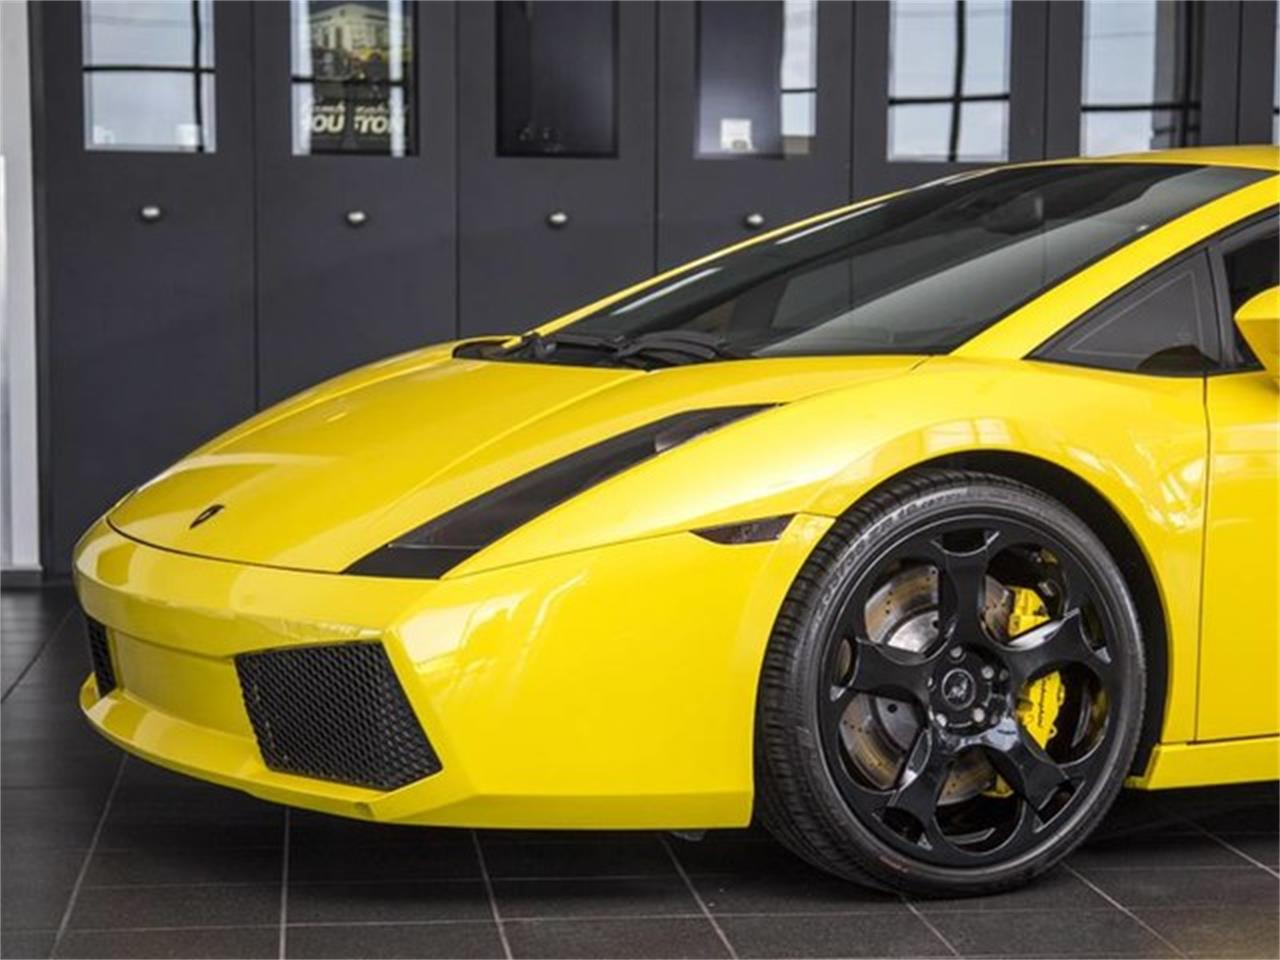 2004 Lamborghini Gallardo For Sale Classiccars Com Cc 892269